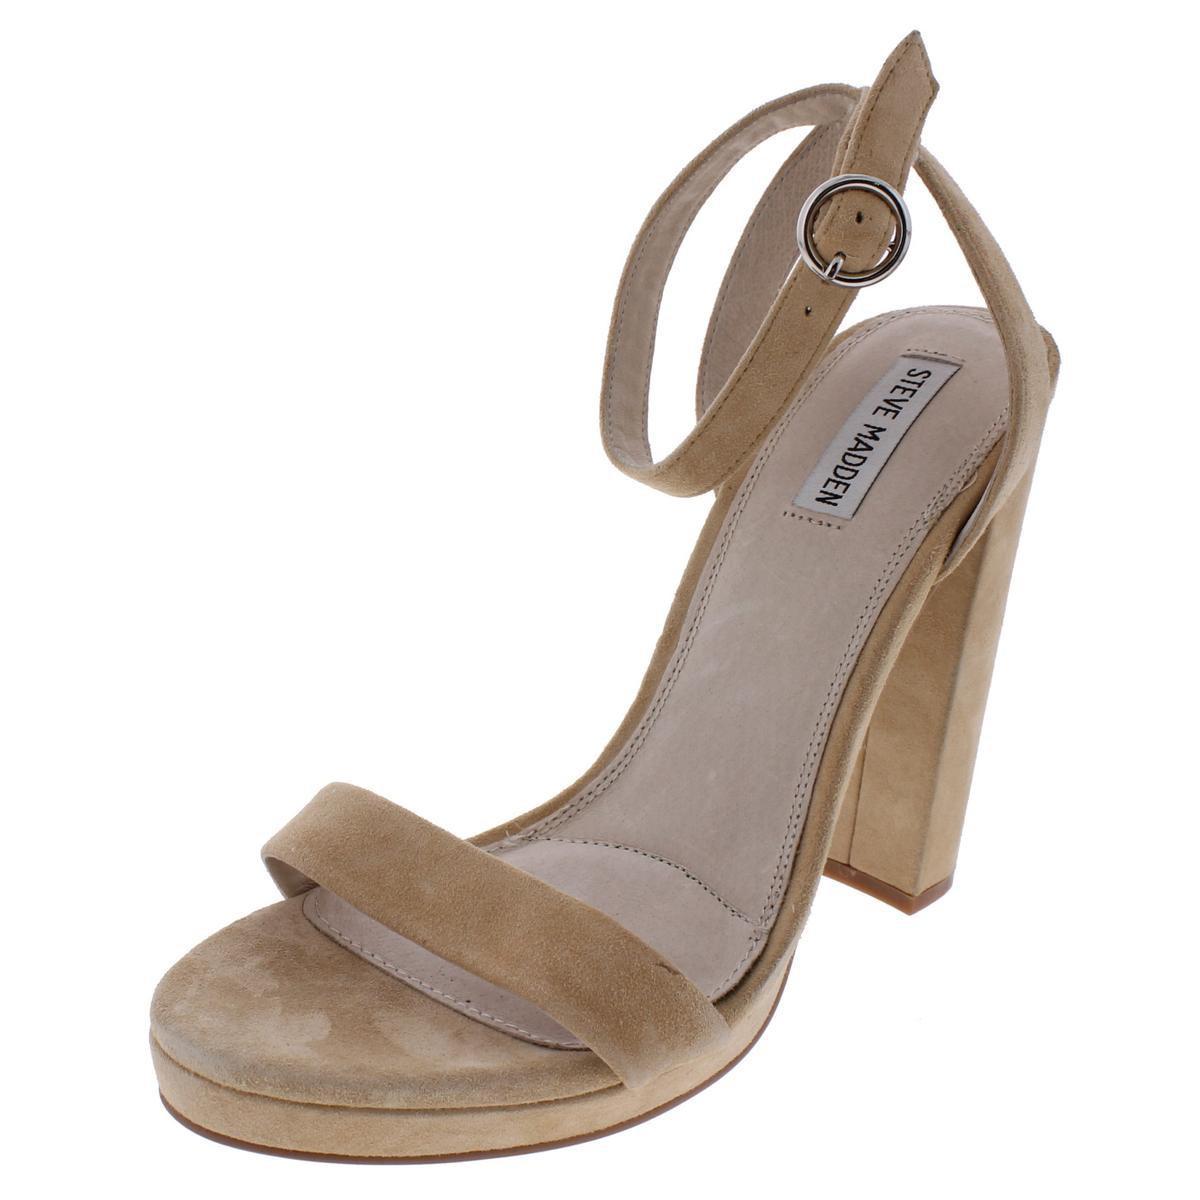 f352e44afc2 Lyst - Steve Madden Addon Open Toe Chunky Heel Dress Sandals